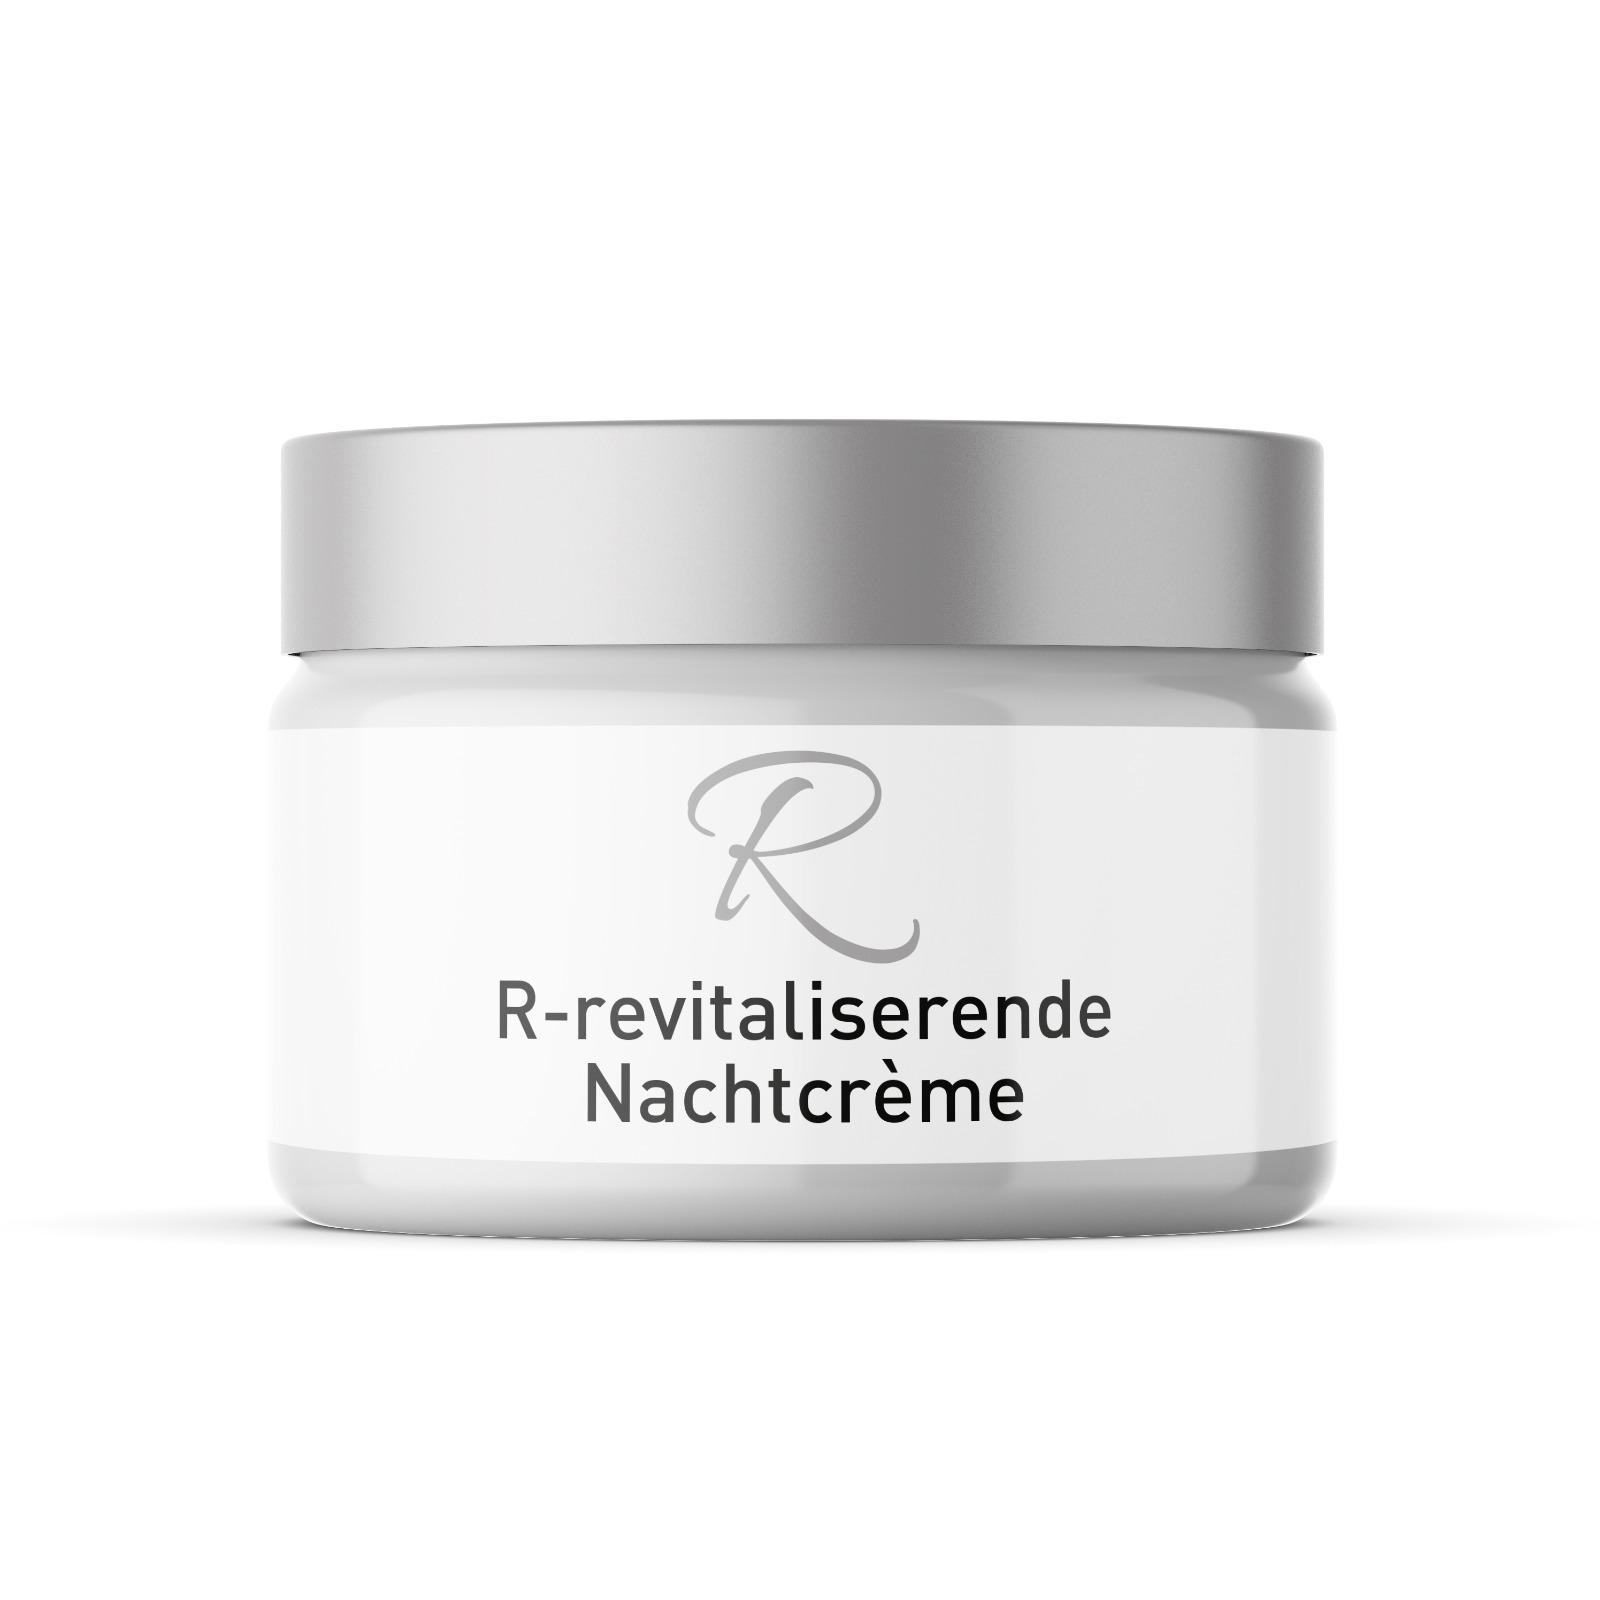 R-Line revitaliserende nachtcrème